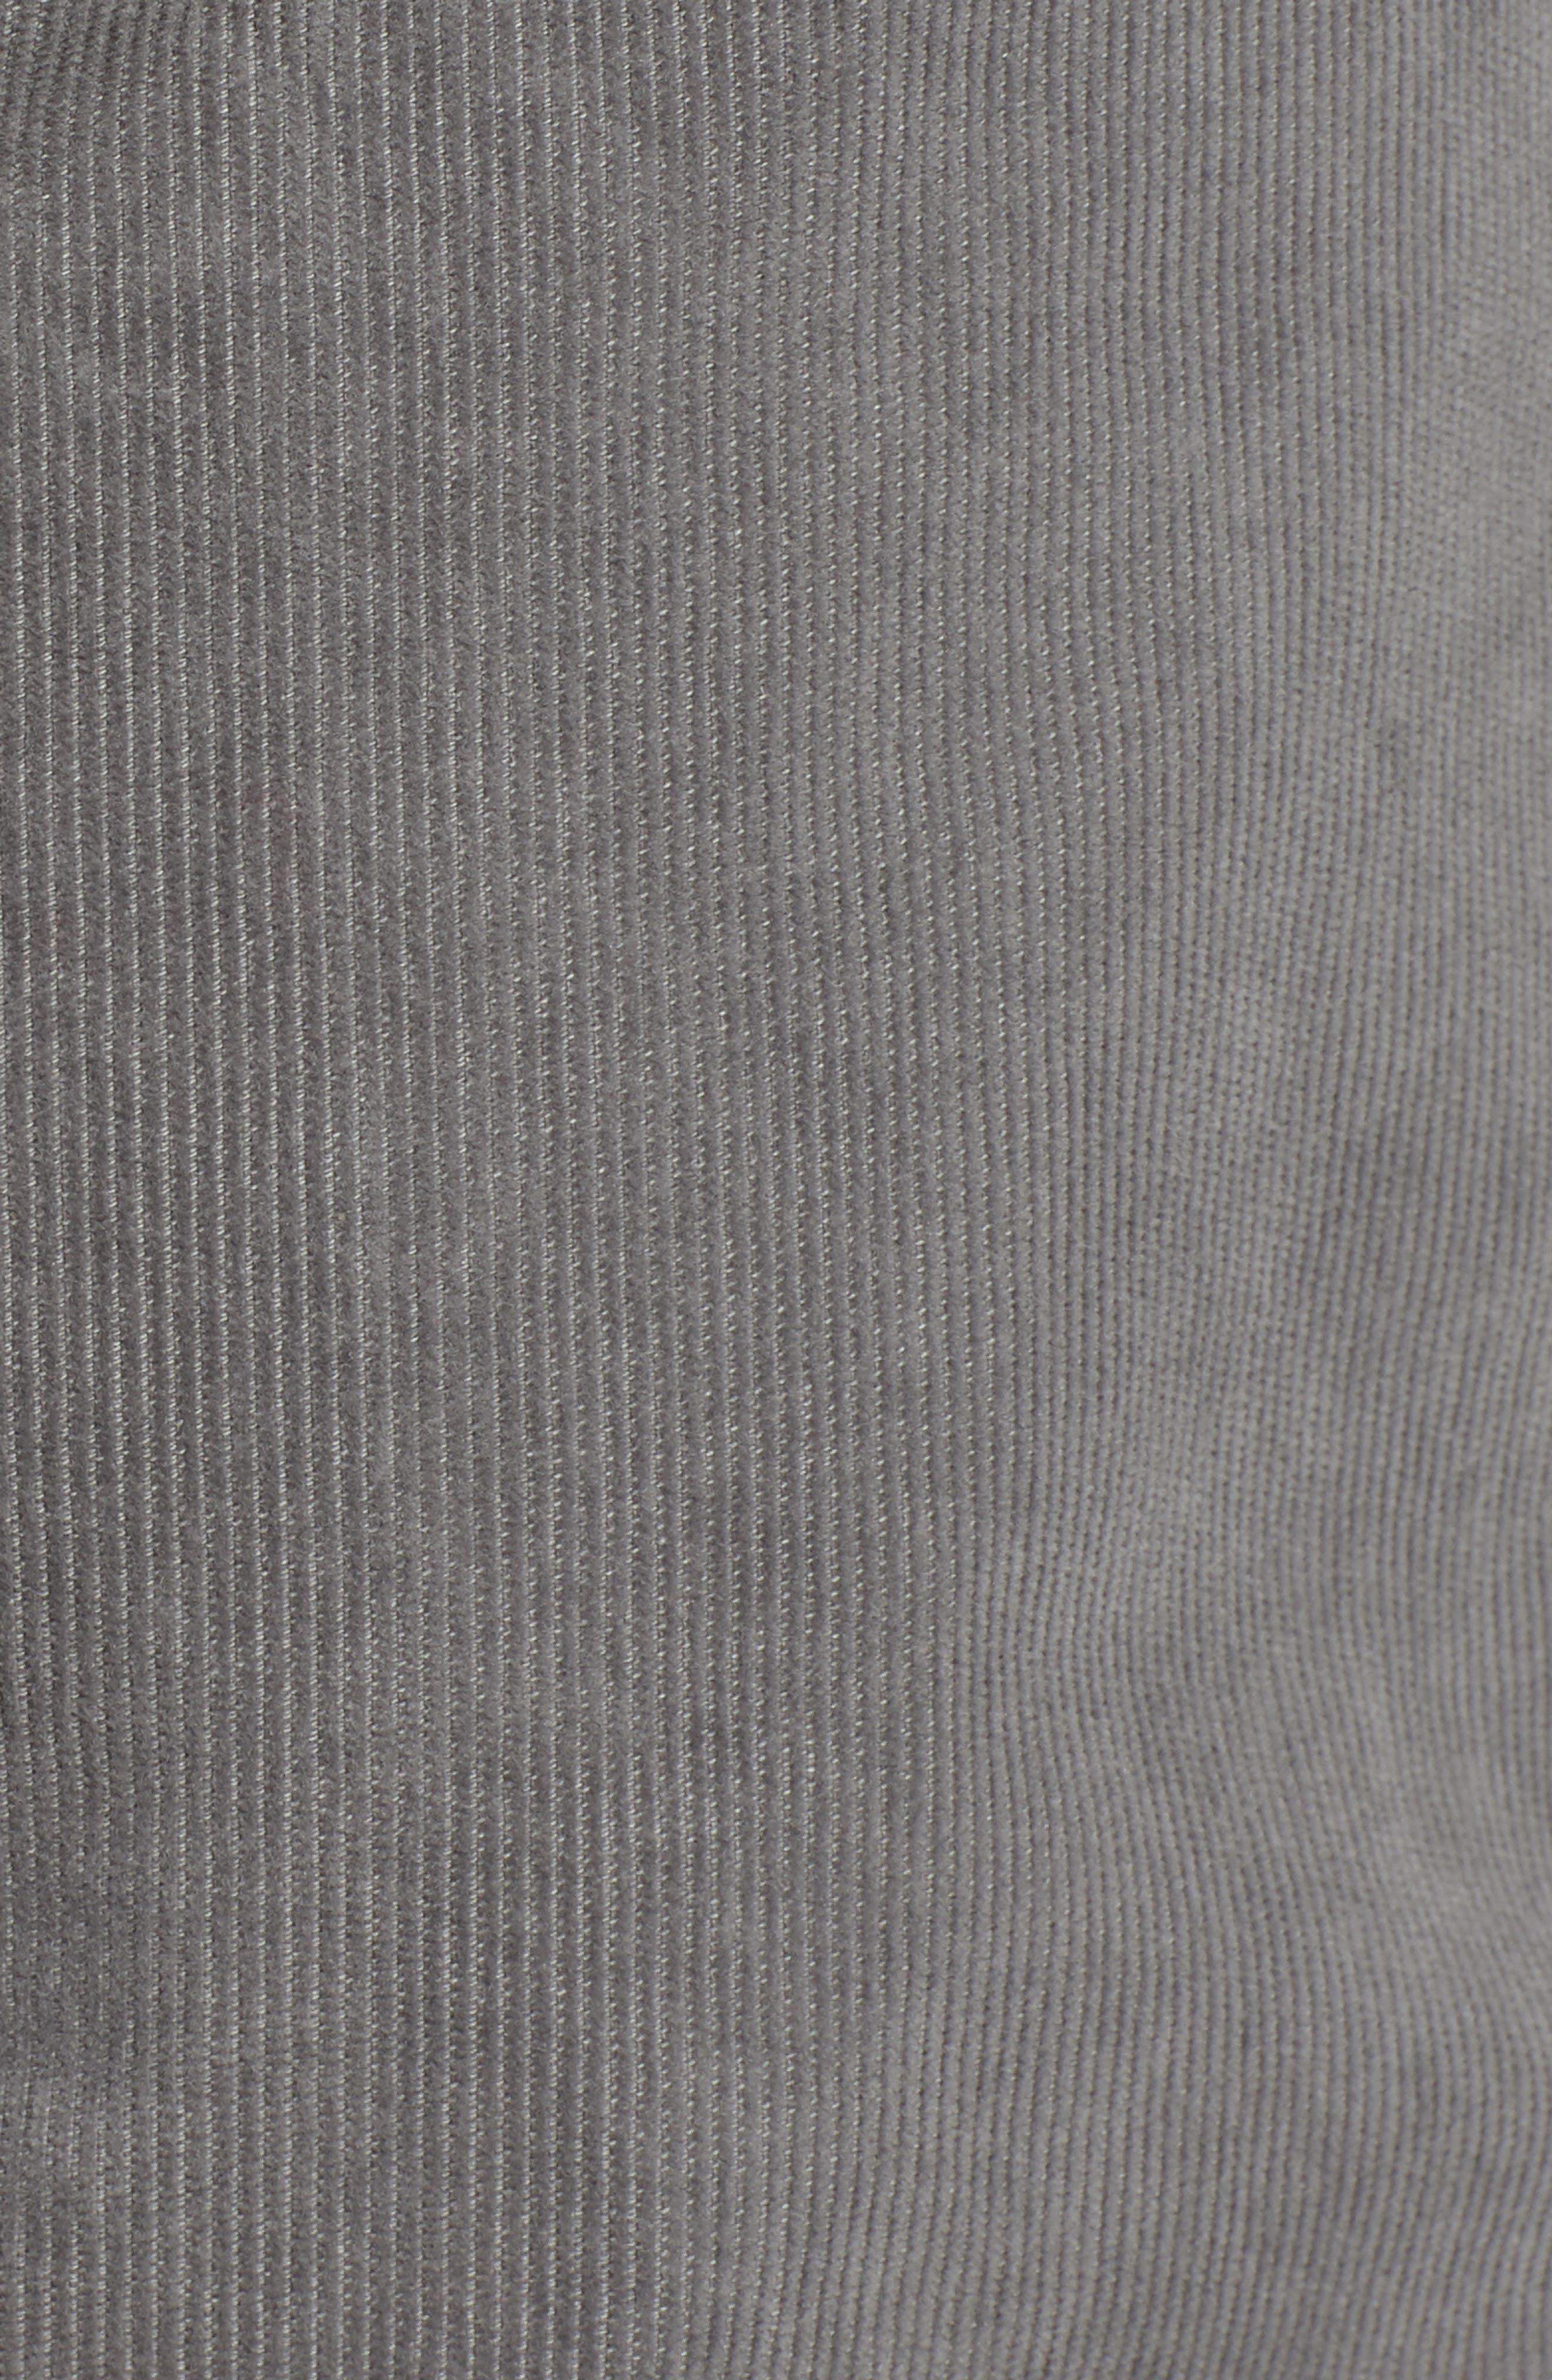 Everett Straight Leg Corduroy Pants,                             Alternate thumbnail 5, color,                             SULFUR AUTUMN FOG